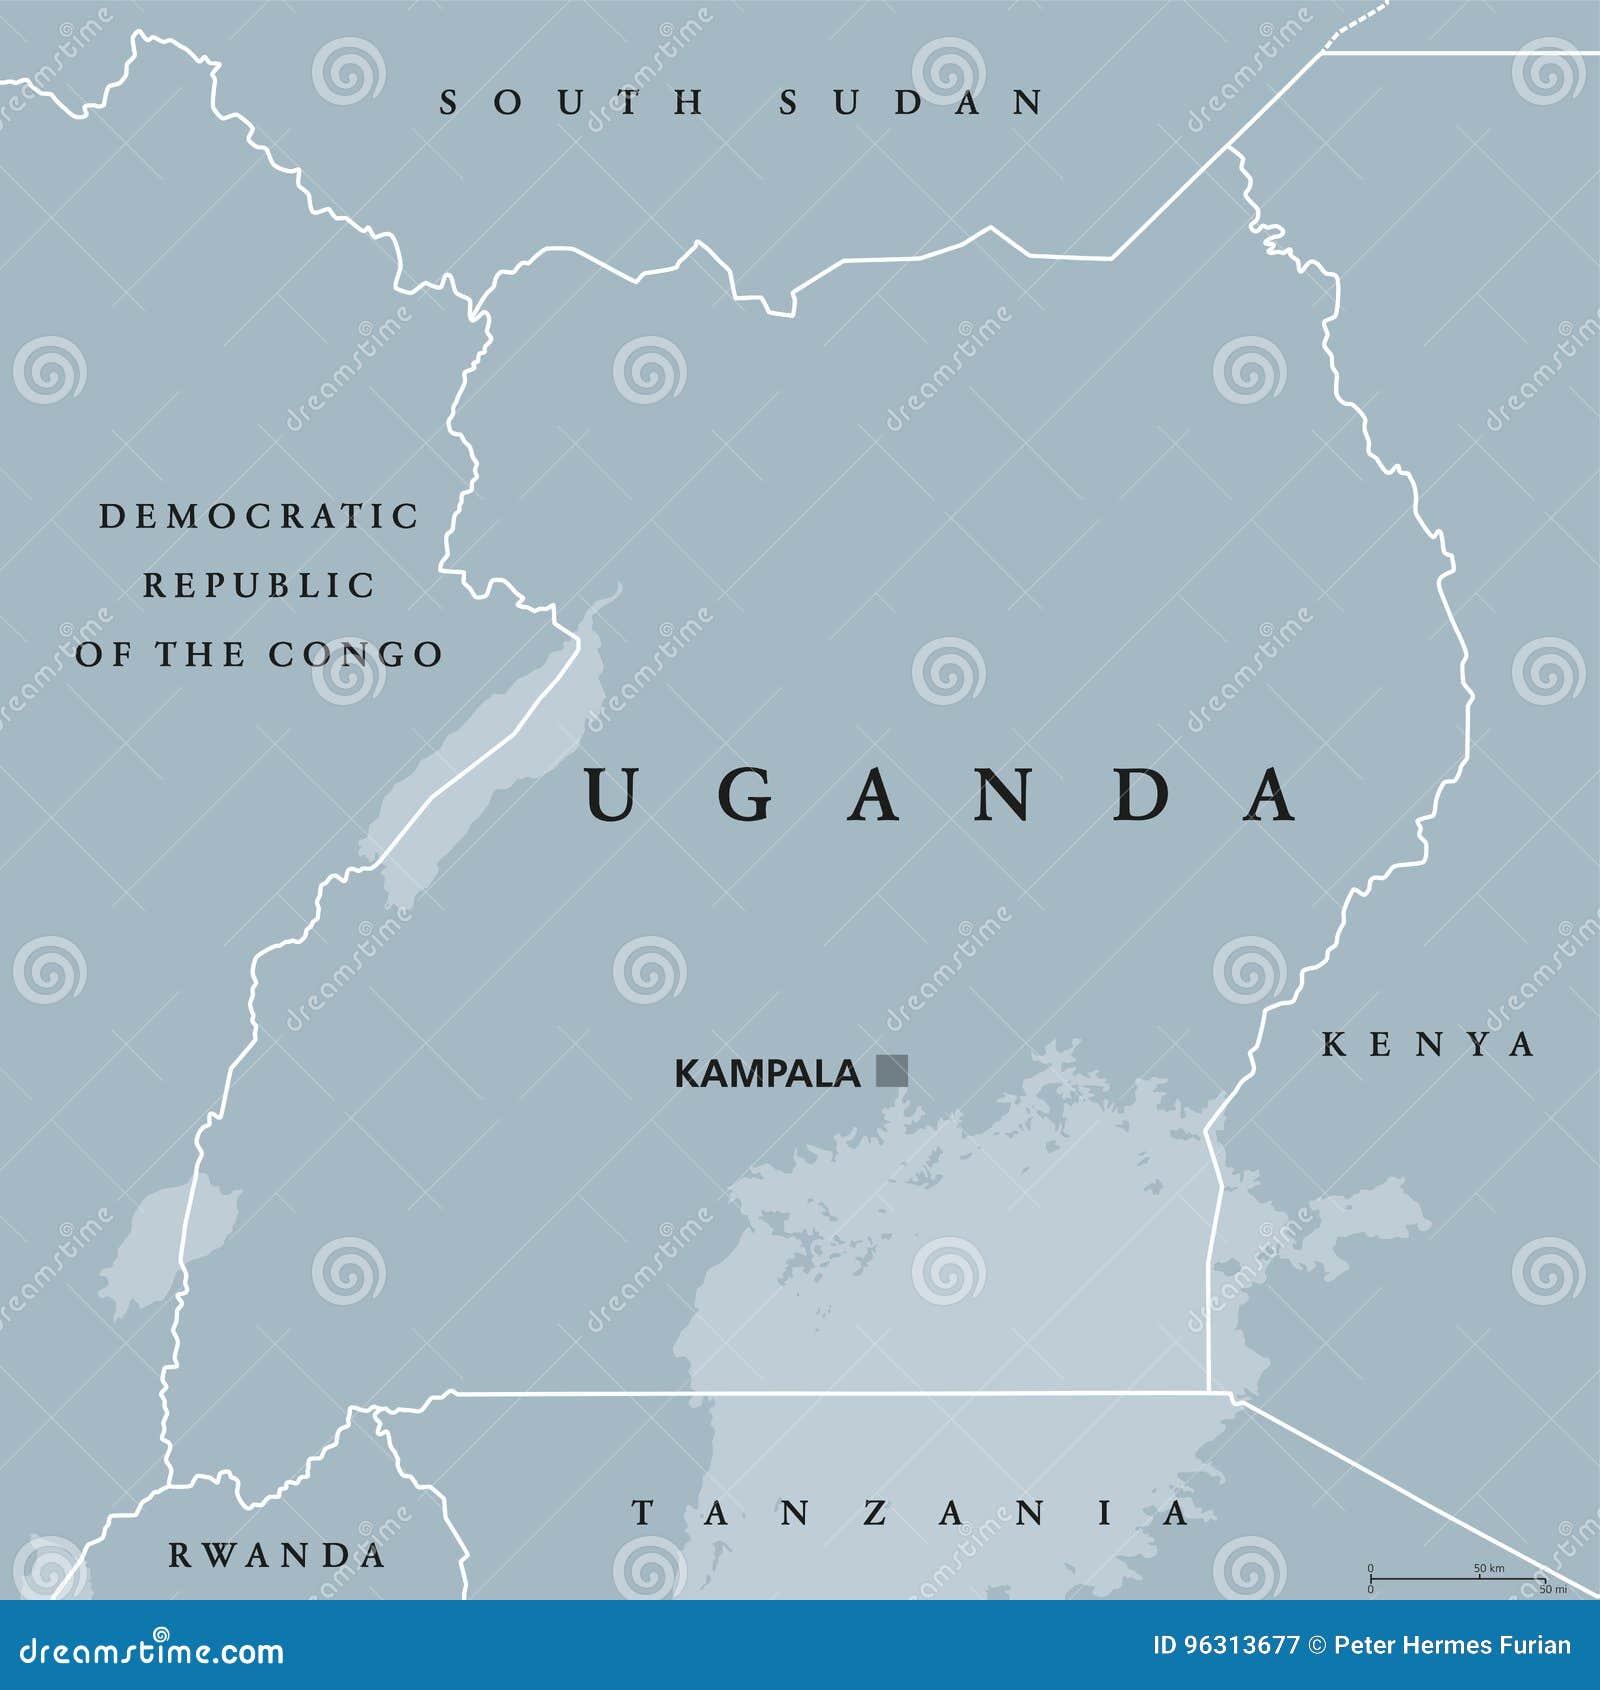 Map Of Africa Lake Victoria.Uganda Political Map Stock Vector Illustration Of Lake 96313677